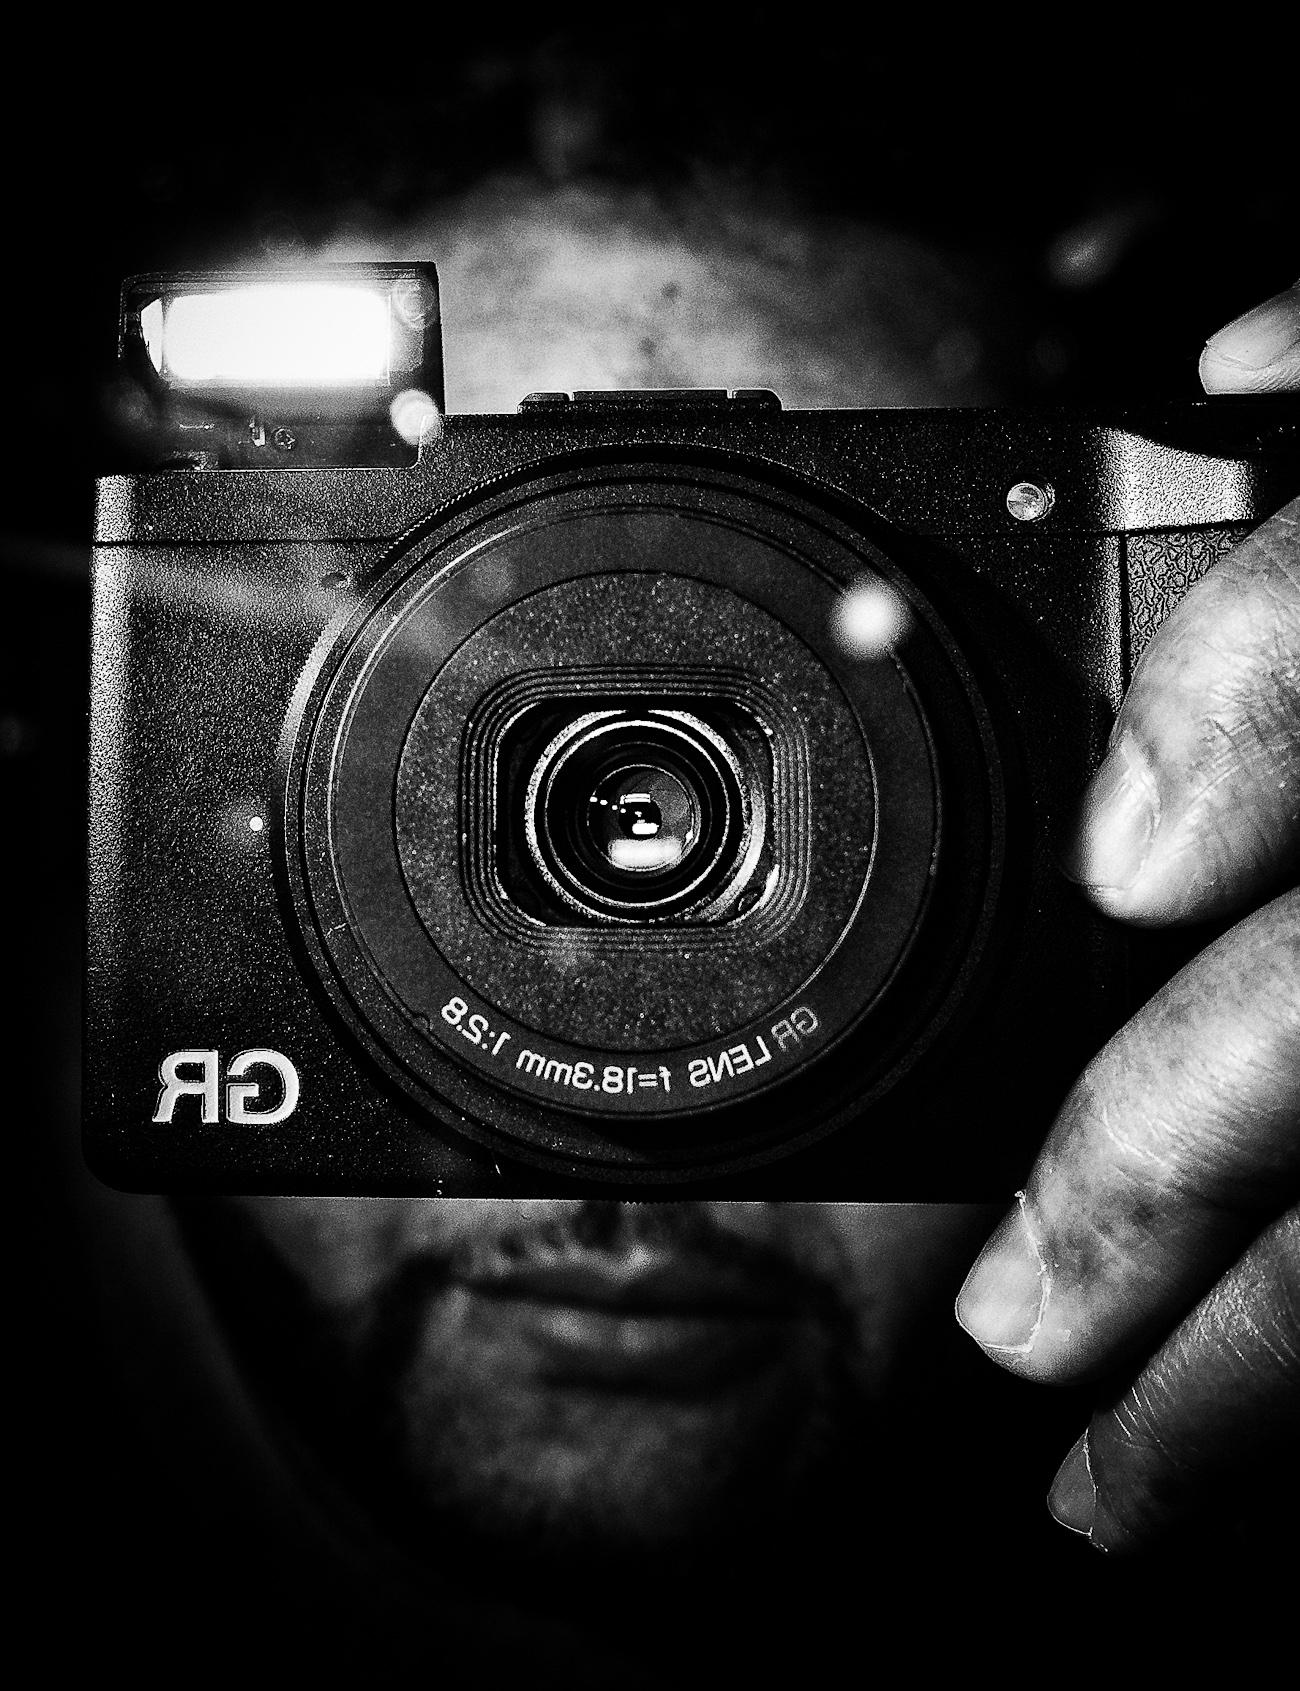 ricoh gr review, ricoh gr, images, documentary, street, candid, portrait, photography, ricoh gr, ricoh, grd2, grd3, grd4, grd5, pentax, pentax-ricoh, images, pictures, daido, moriyama, jorge, ledesma, gr, review,ricoh gr revisão, ricoh gr, imagens, documentários, rua, revisão,RICOH GR recenze, RICOH GR, obrázky, dokumentární, ulice, upřímný, portrét, fotografie,ricoh gr revisione, ricoh gr, immagini, documentari, via, schietto, ritratto, fotografia,Ricoh GR recension, Ricoh GR, bilder, dokumentär, gata, uppriktig, porträtt, fotografi,Ricoh GR examen, Ricoh GR, images, documentaire, rue, candide, portrait, photographie,Ricoh gr gennemgang, Ricoh GR, billeder, dokumentar, gade, åbenhjertig, portræt, fotografering,Ricoh GR recenzja, ricoh gr, zdjęć, filmów dokumentalnych, ulica, szczery, portret, fotografia,Ricoh GR Bewertung Ricoh GR, Bilder, Dokumentarfilm, Straße, offen, Porträt, Fotografie,理光GR審查,理光GR,圖片,紀錄片,街道,坦誠,肖像,攝影,リコーGR見直し、リコーGR、画像、ドキュメンタリー、ストリート、スナップ写真、ポートレート、写真、ricoh gr revisão, ricoh gr, imagens, documentários, rua, cândido, retrato, fotografia,icoh gr pagsusuri, ricoh gr, mga larawan, dokumentaryo, kalye, tapat, portrait, photography,